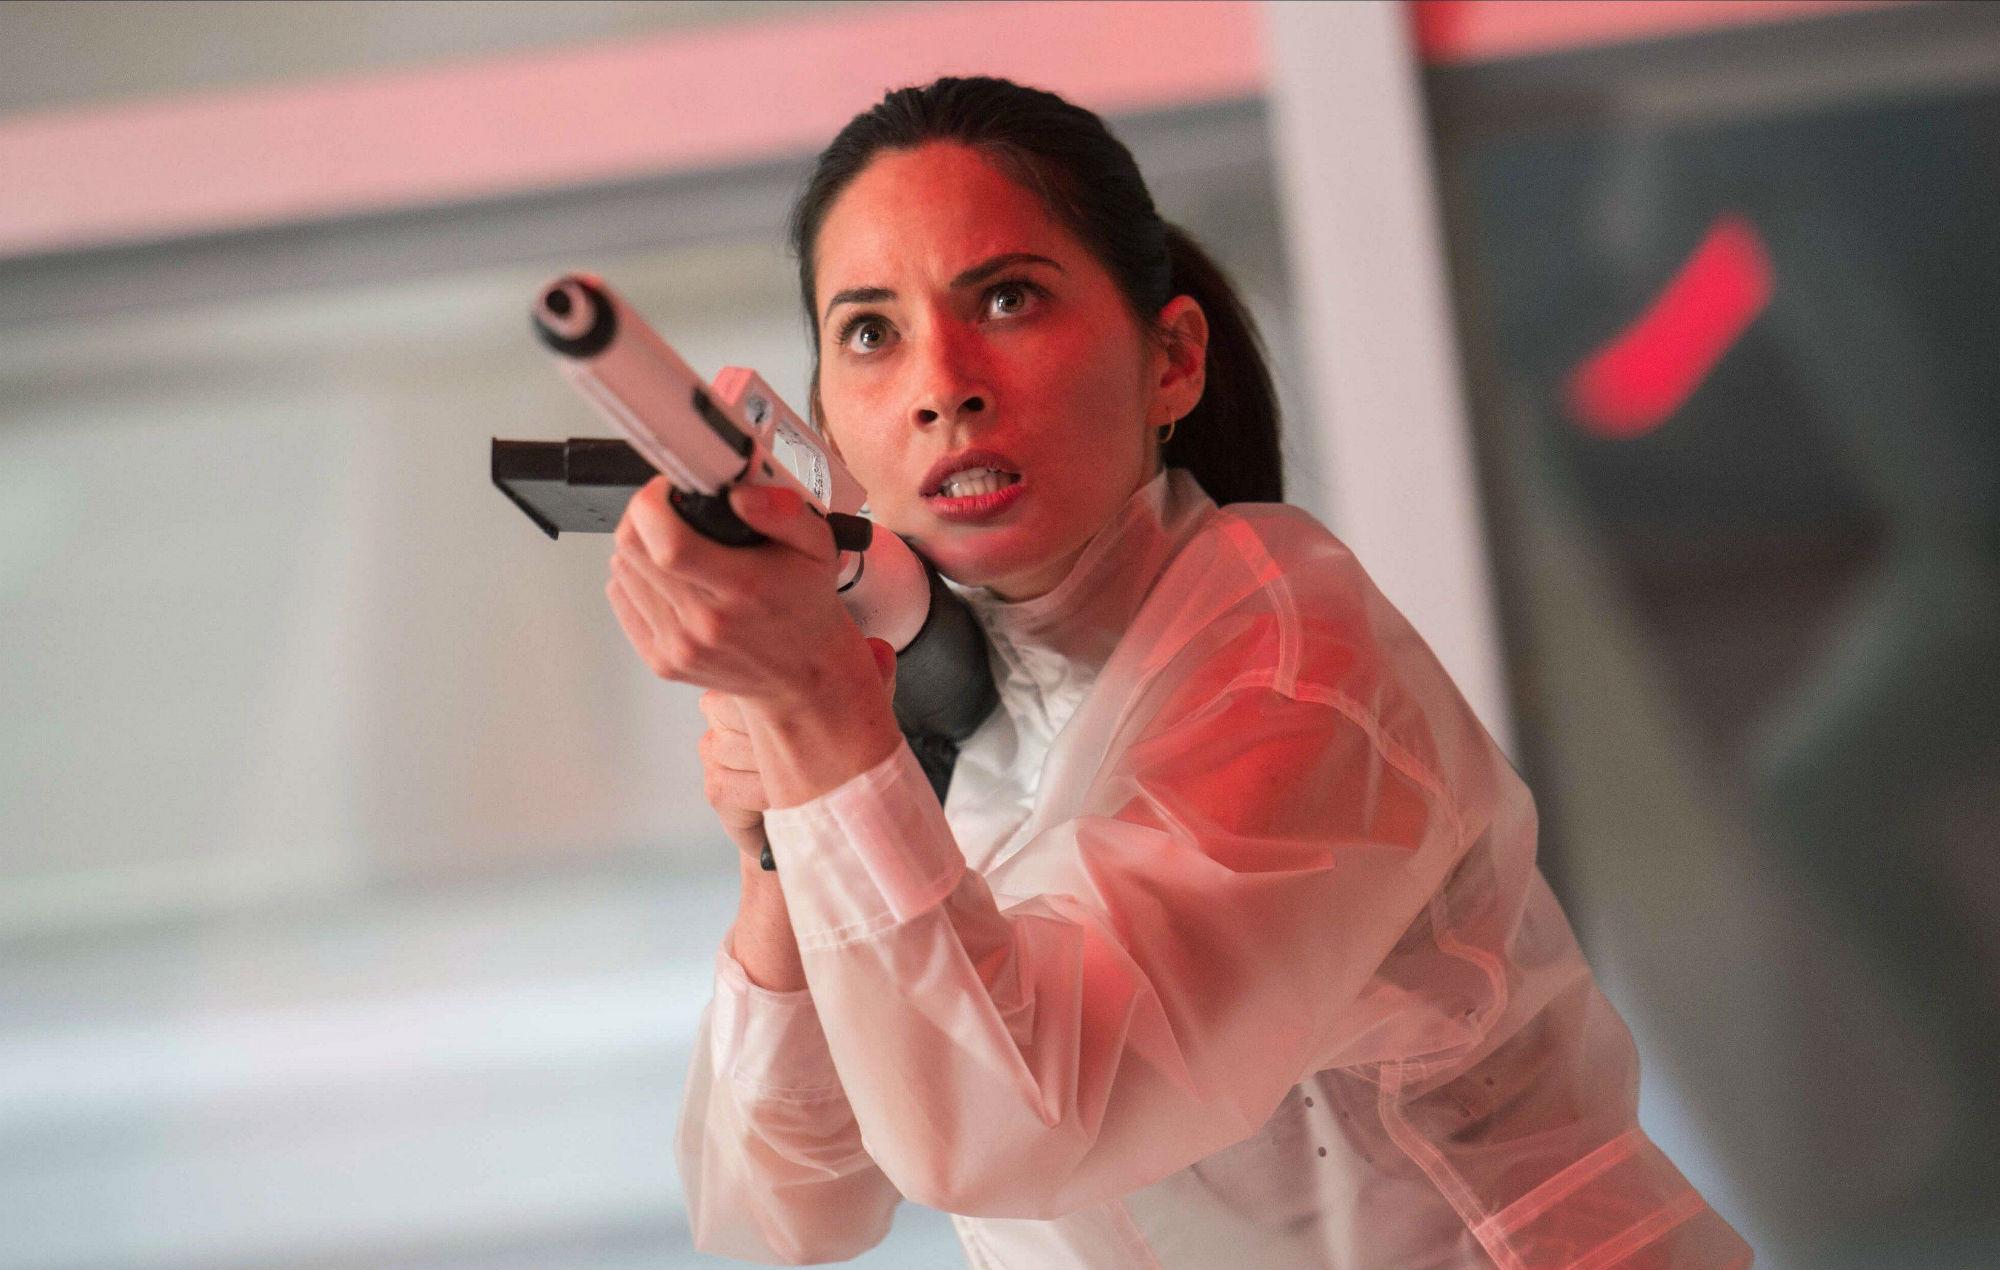 Olivia Munn in The Predator